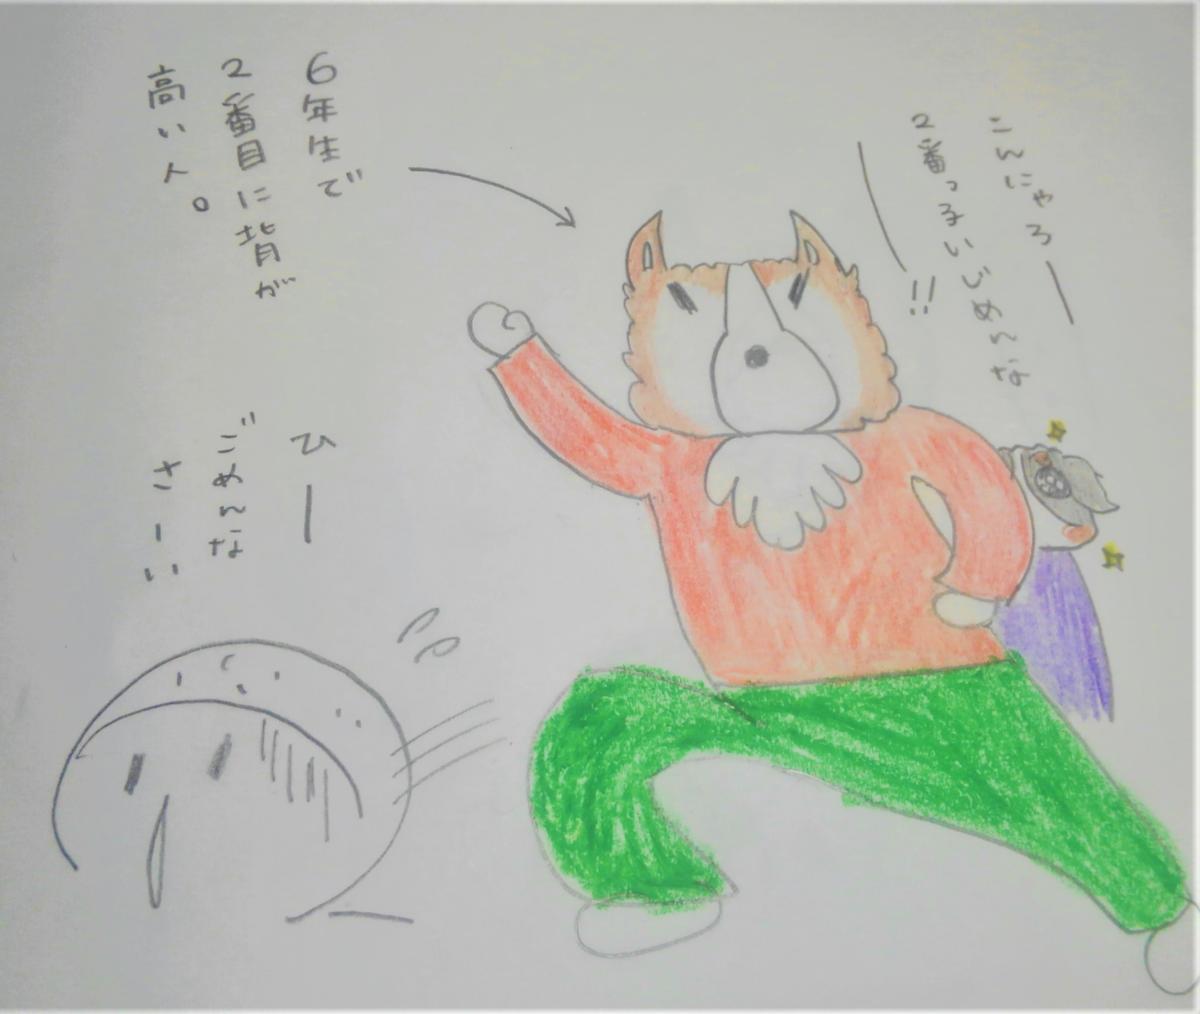 f:id:himawari0growing:20200225211440p:plain